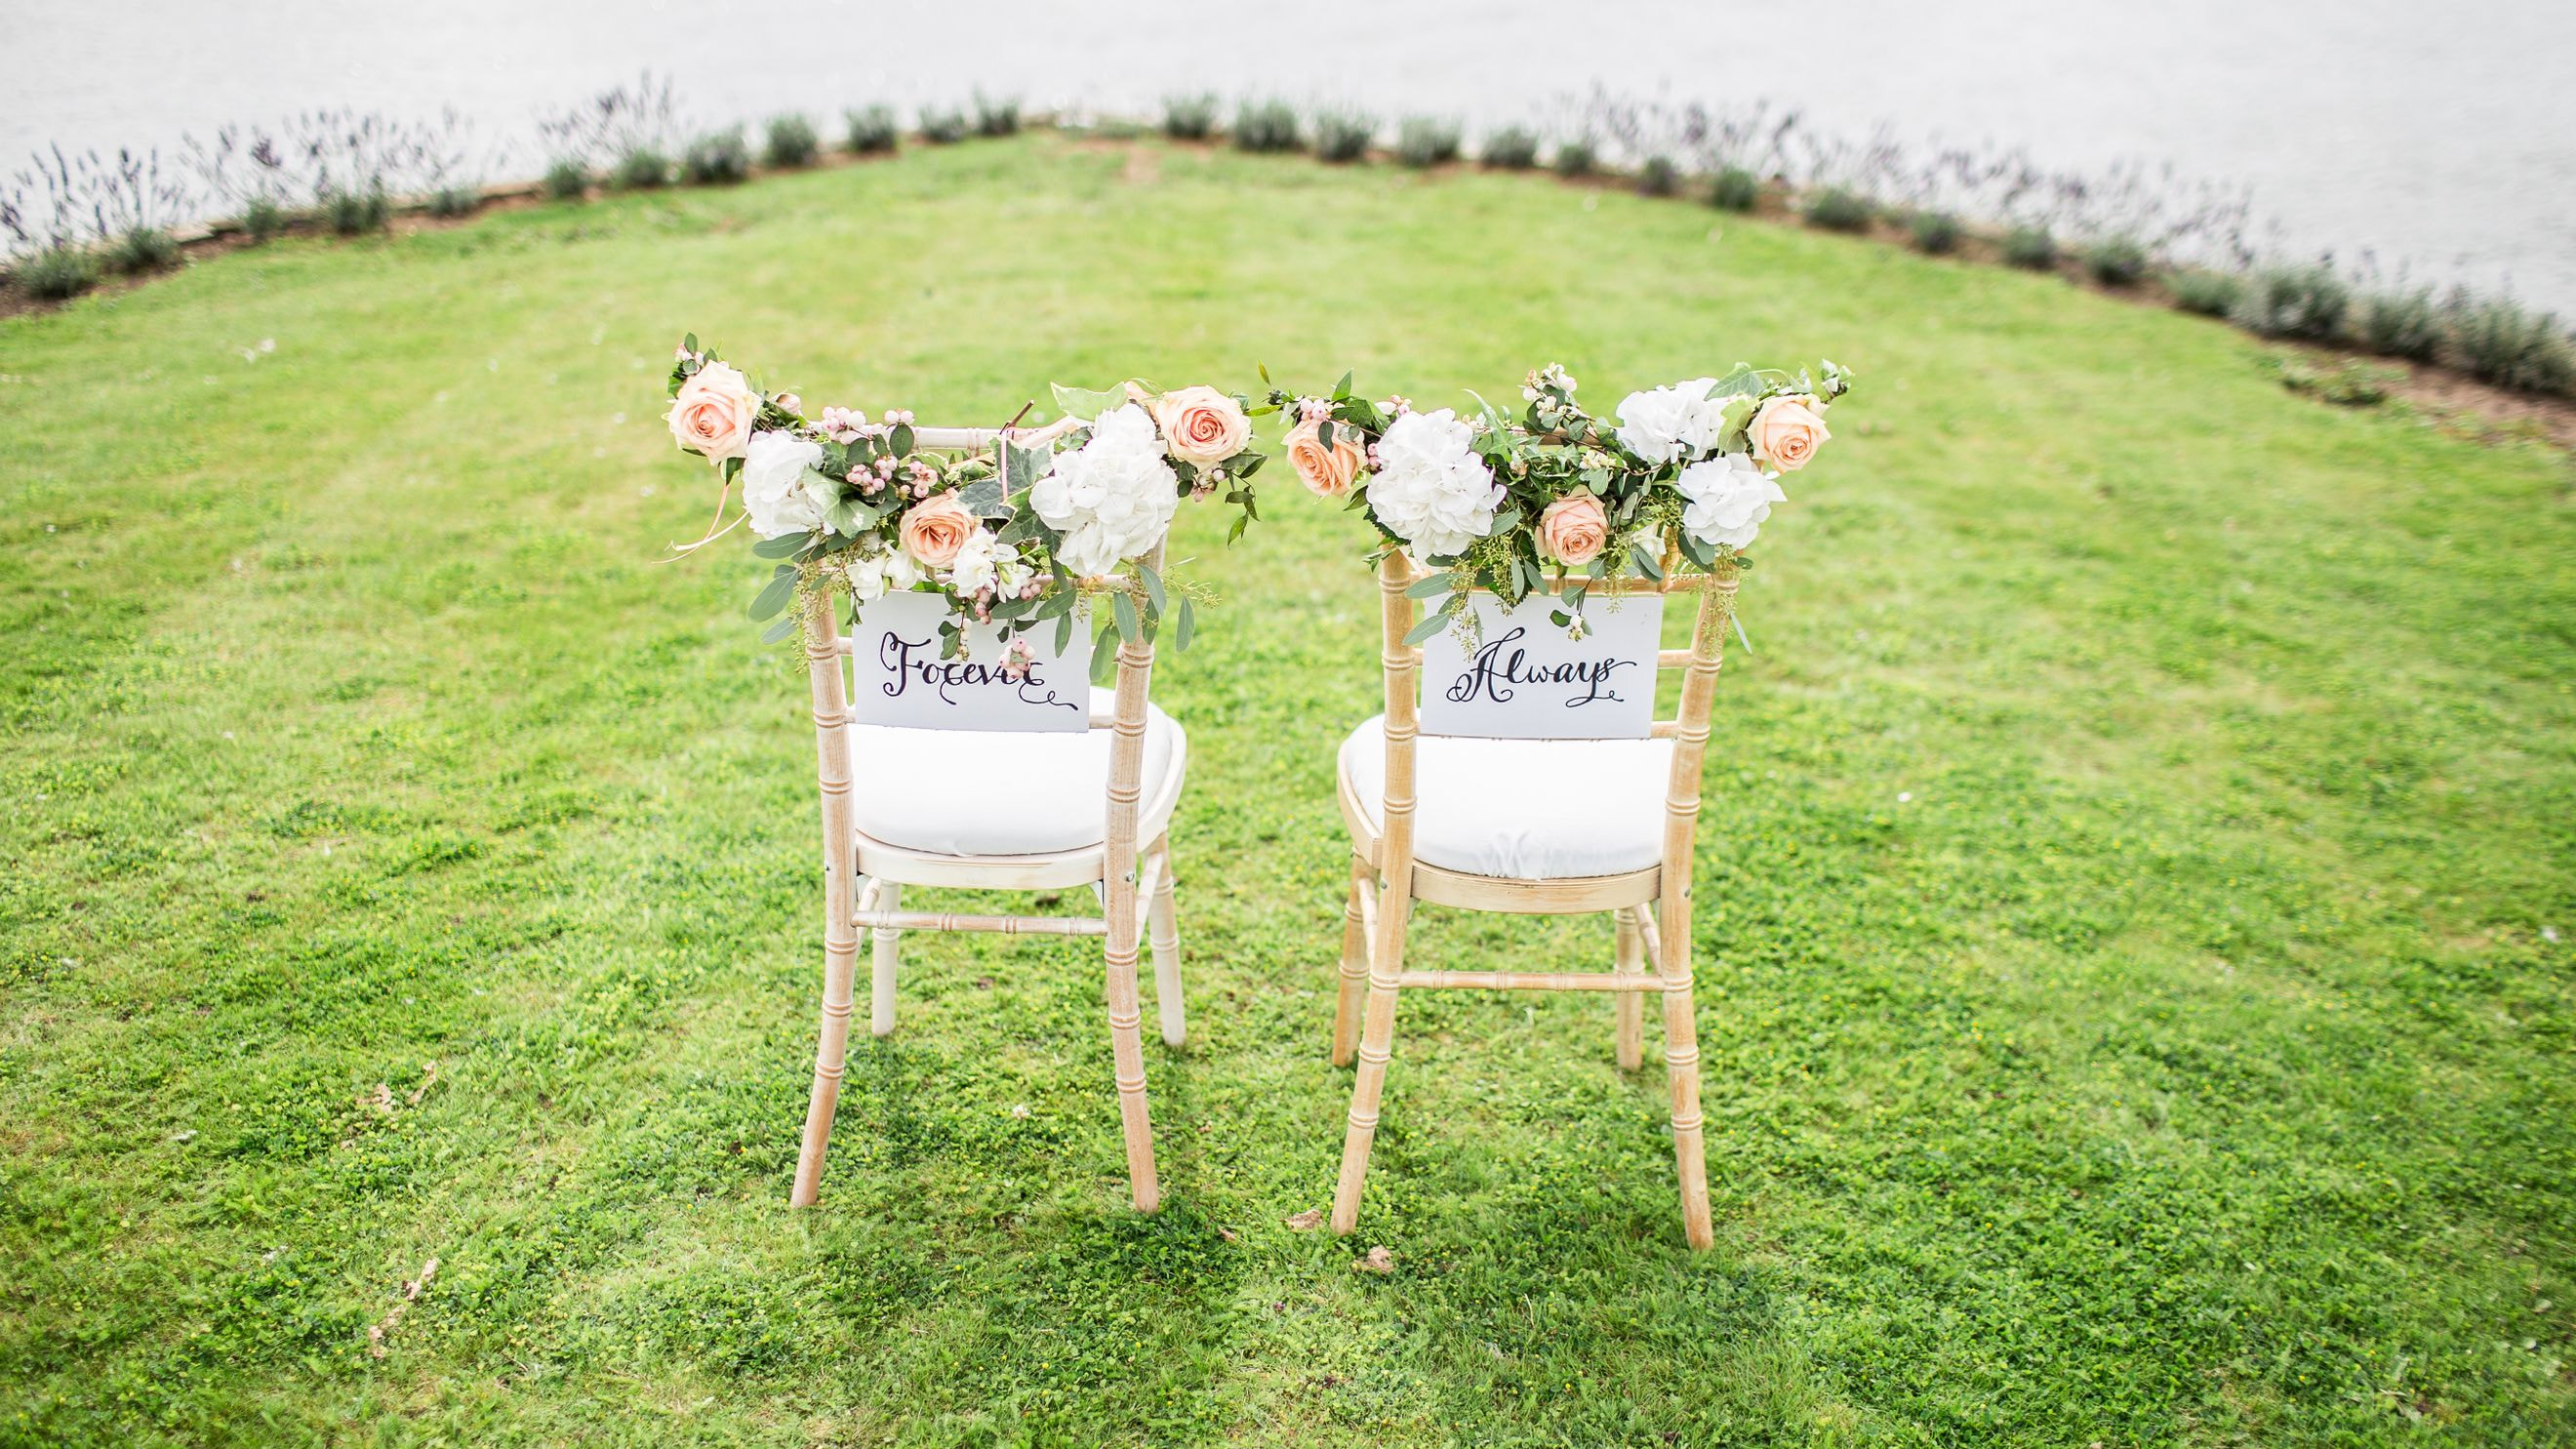 jeremy-wong-weddings-615245-unsplash-tb-2640x1485